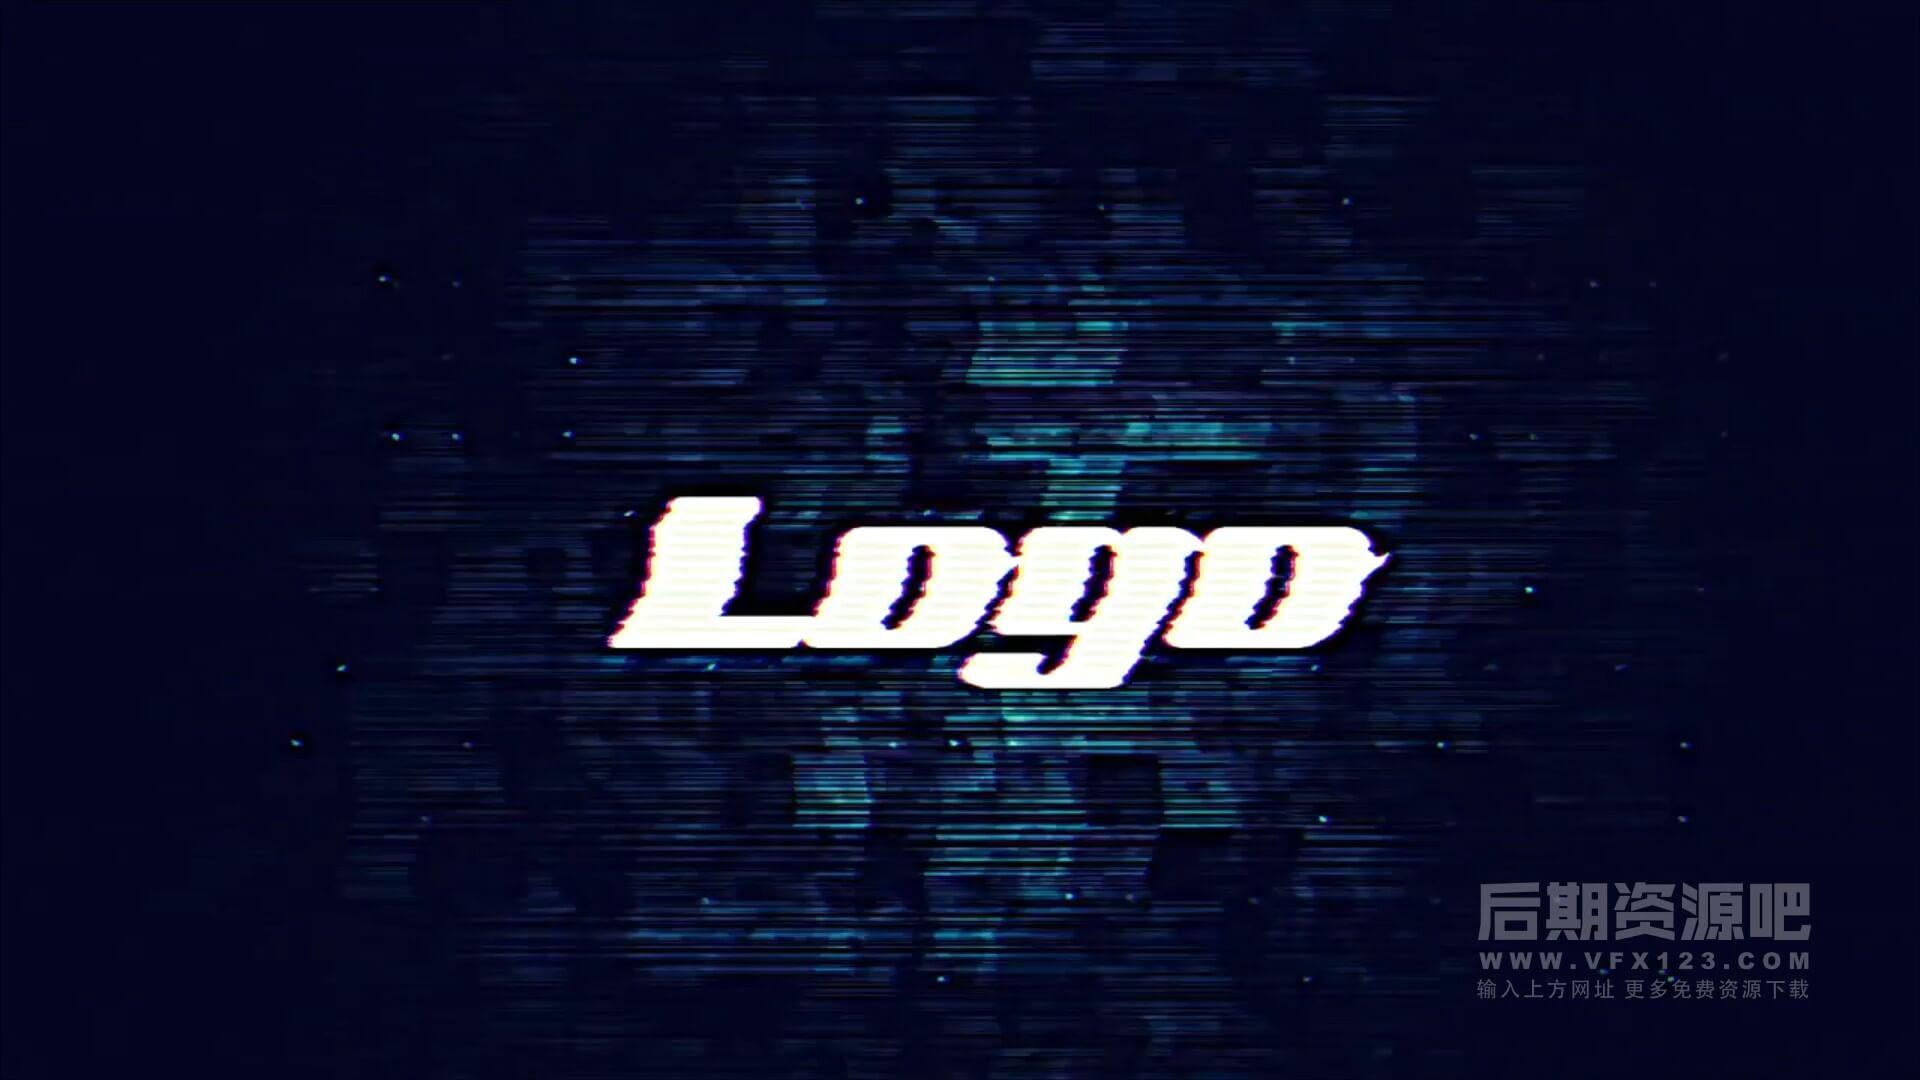 fcpx主题模板 故障干扰特效徽标LOGO展示片头 Glitch Logo